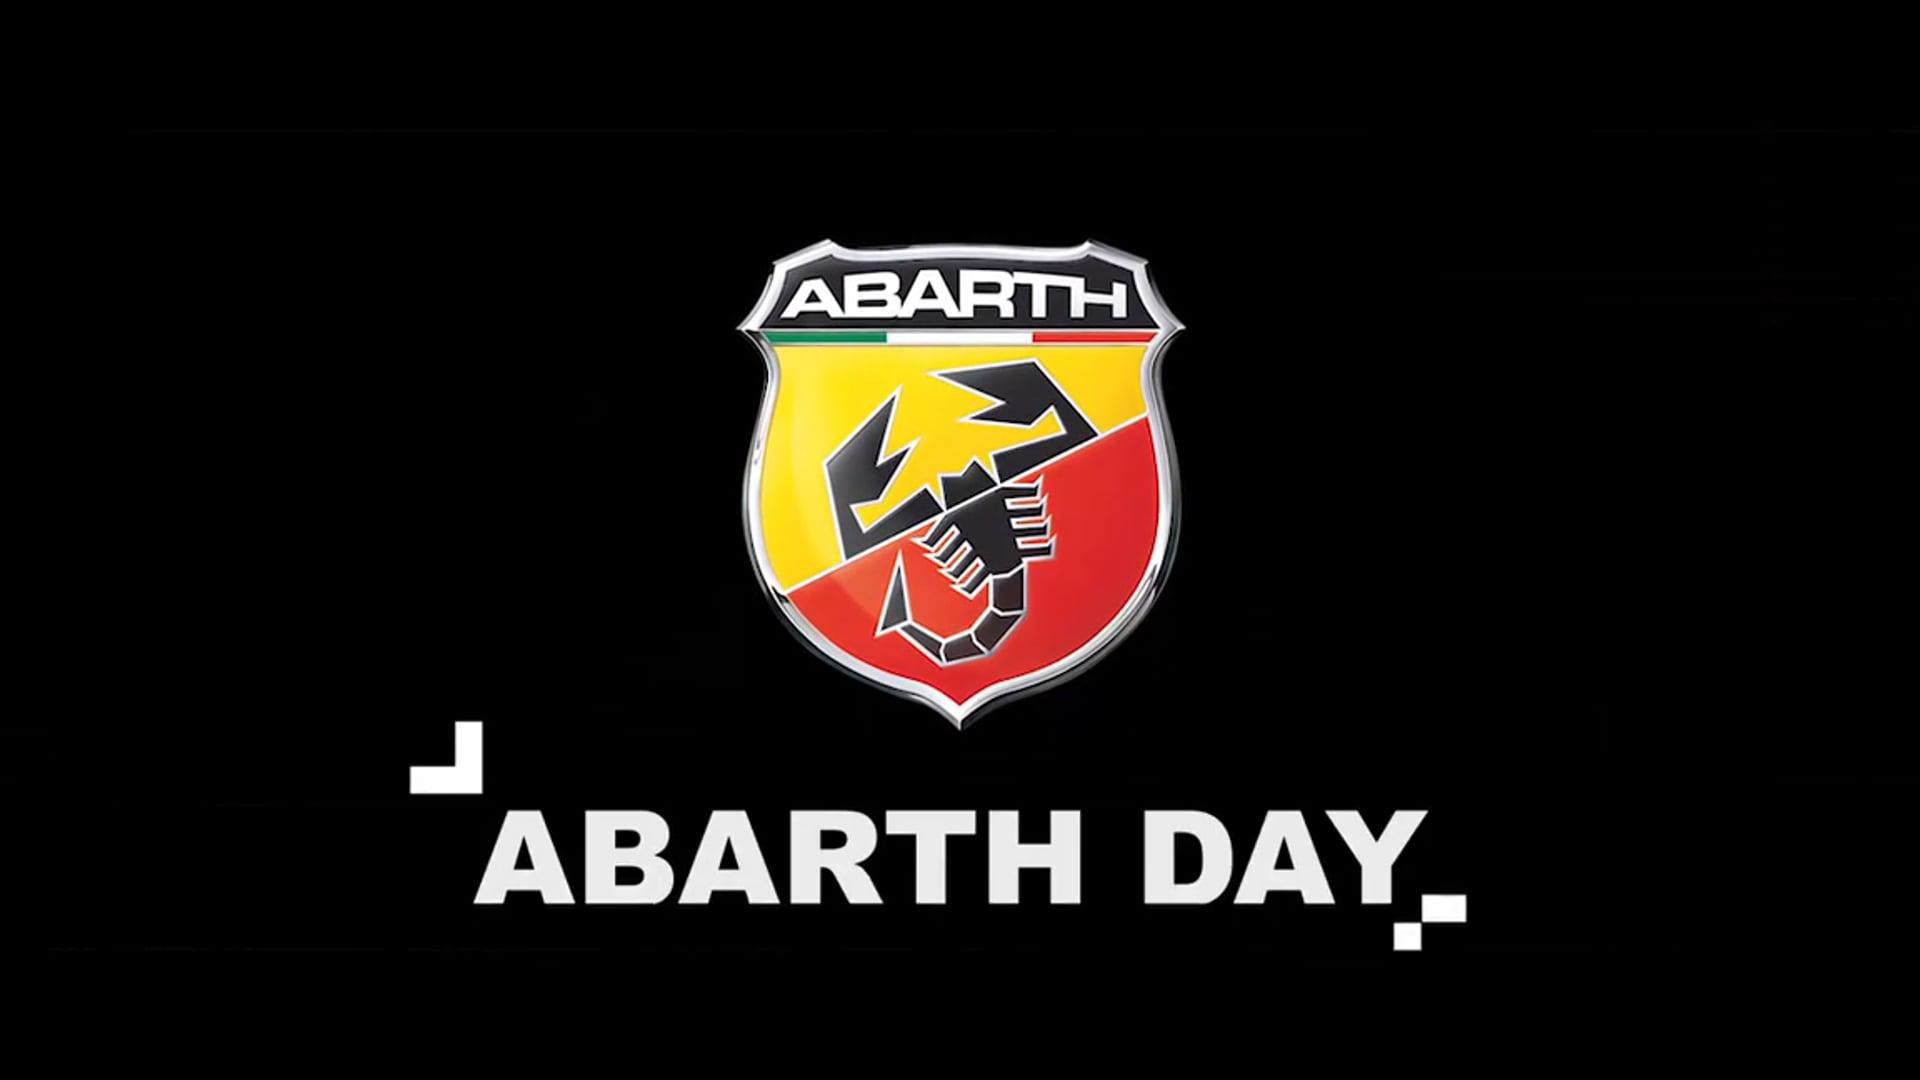 Abarth Day (Full movie)